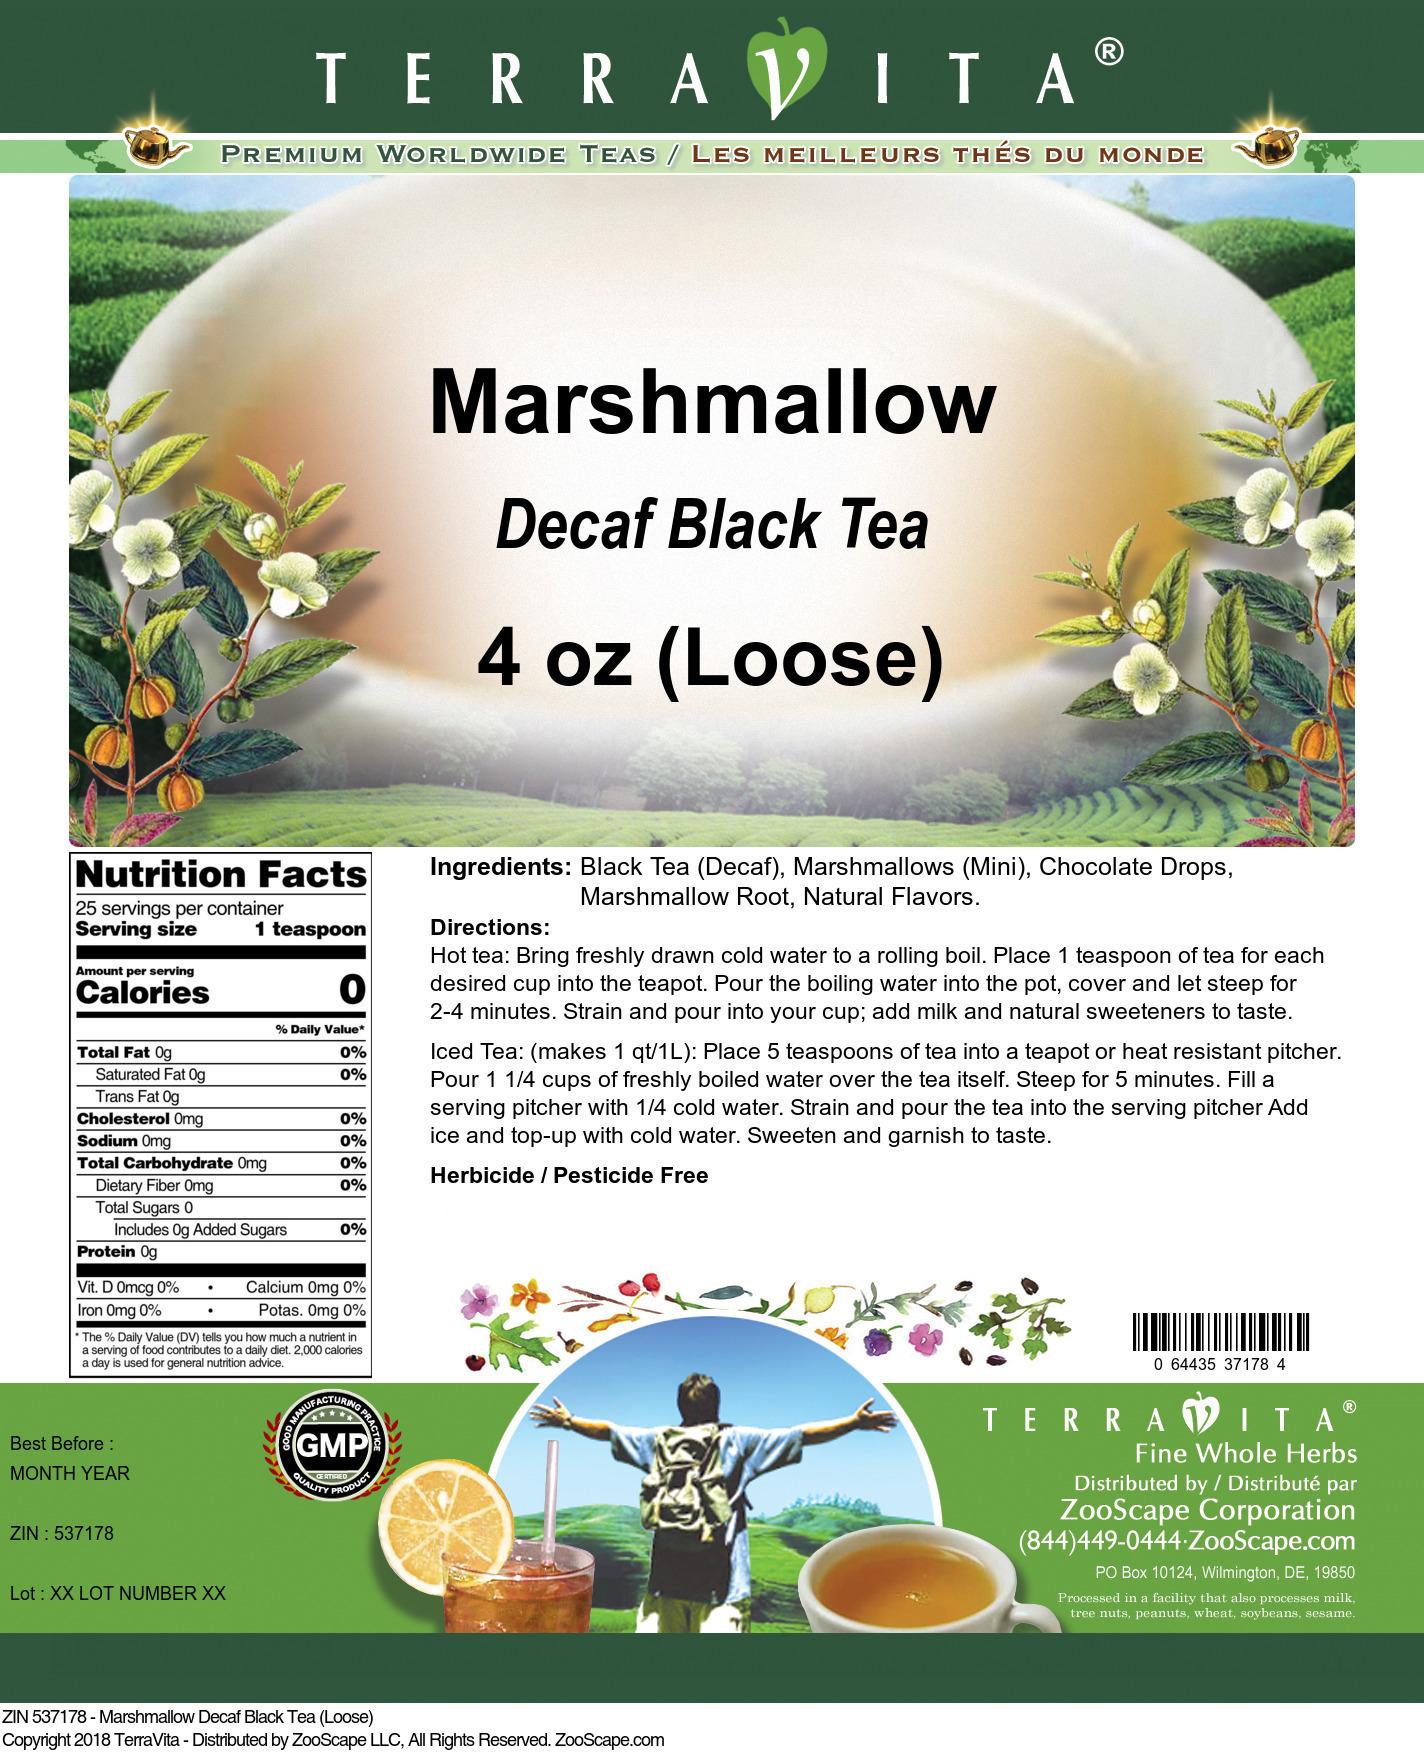 Marshmallow Decaf Black Tea